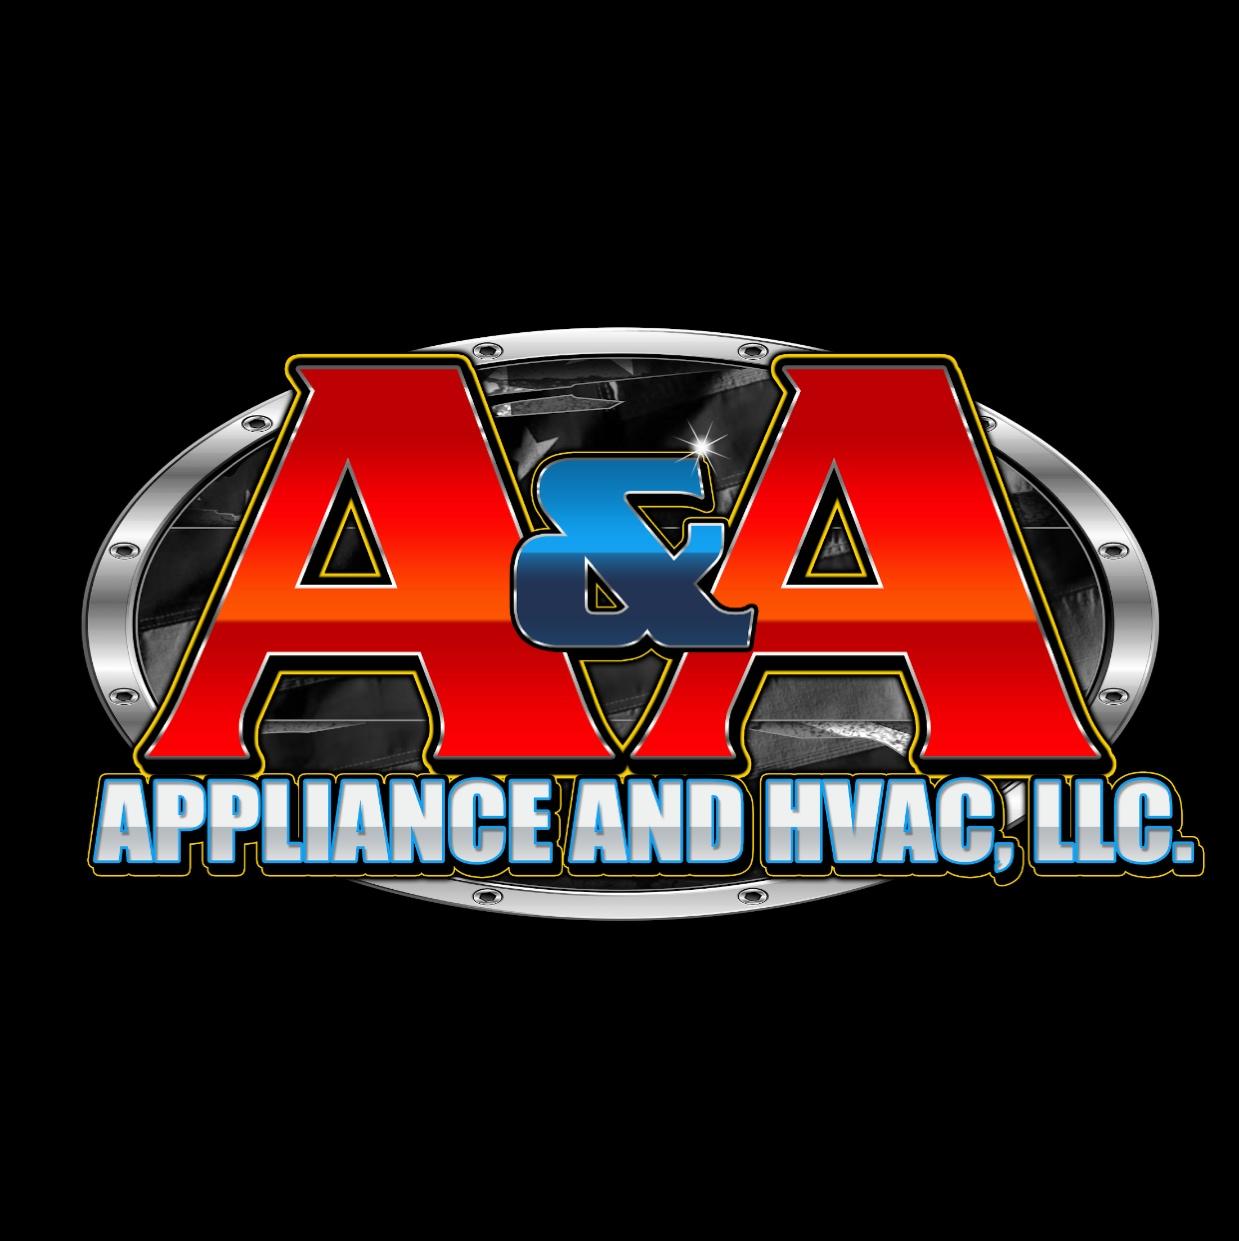 A & A Appliance and HVAC, LLC. logo